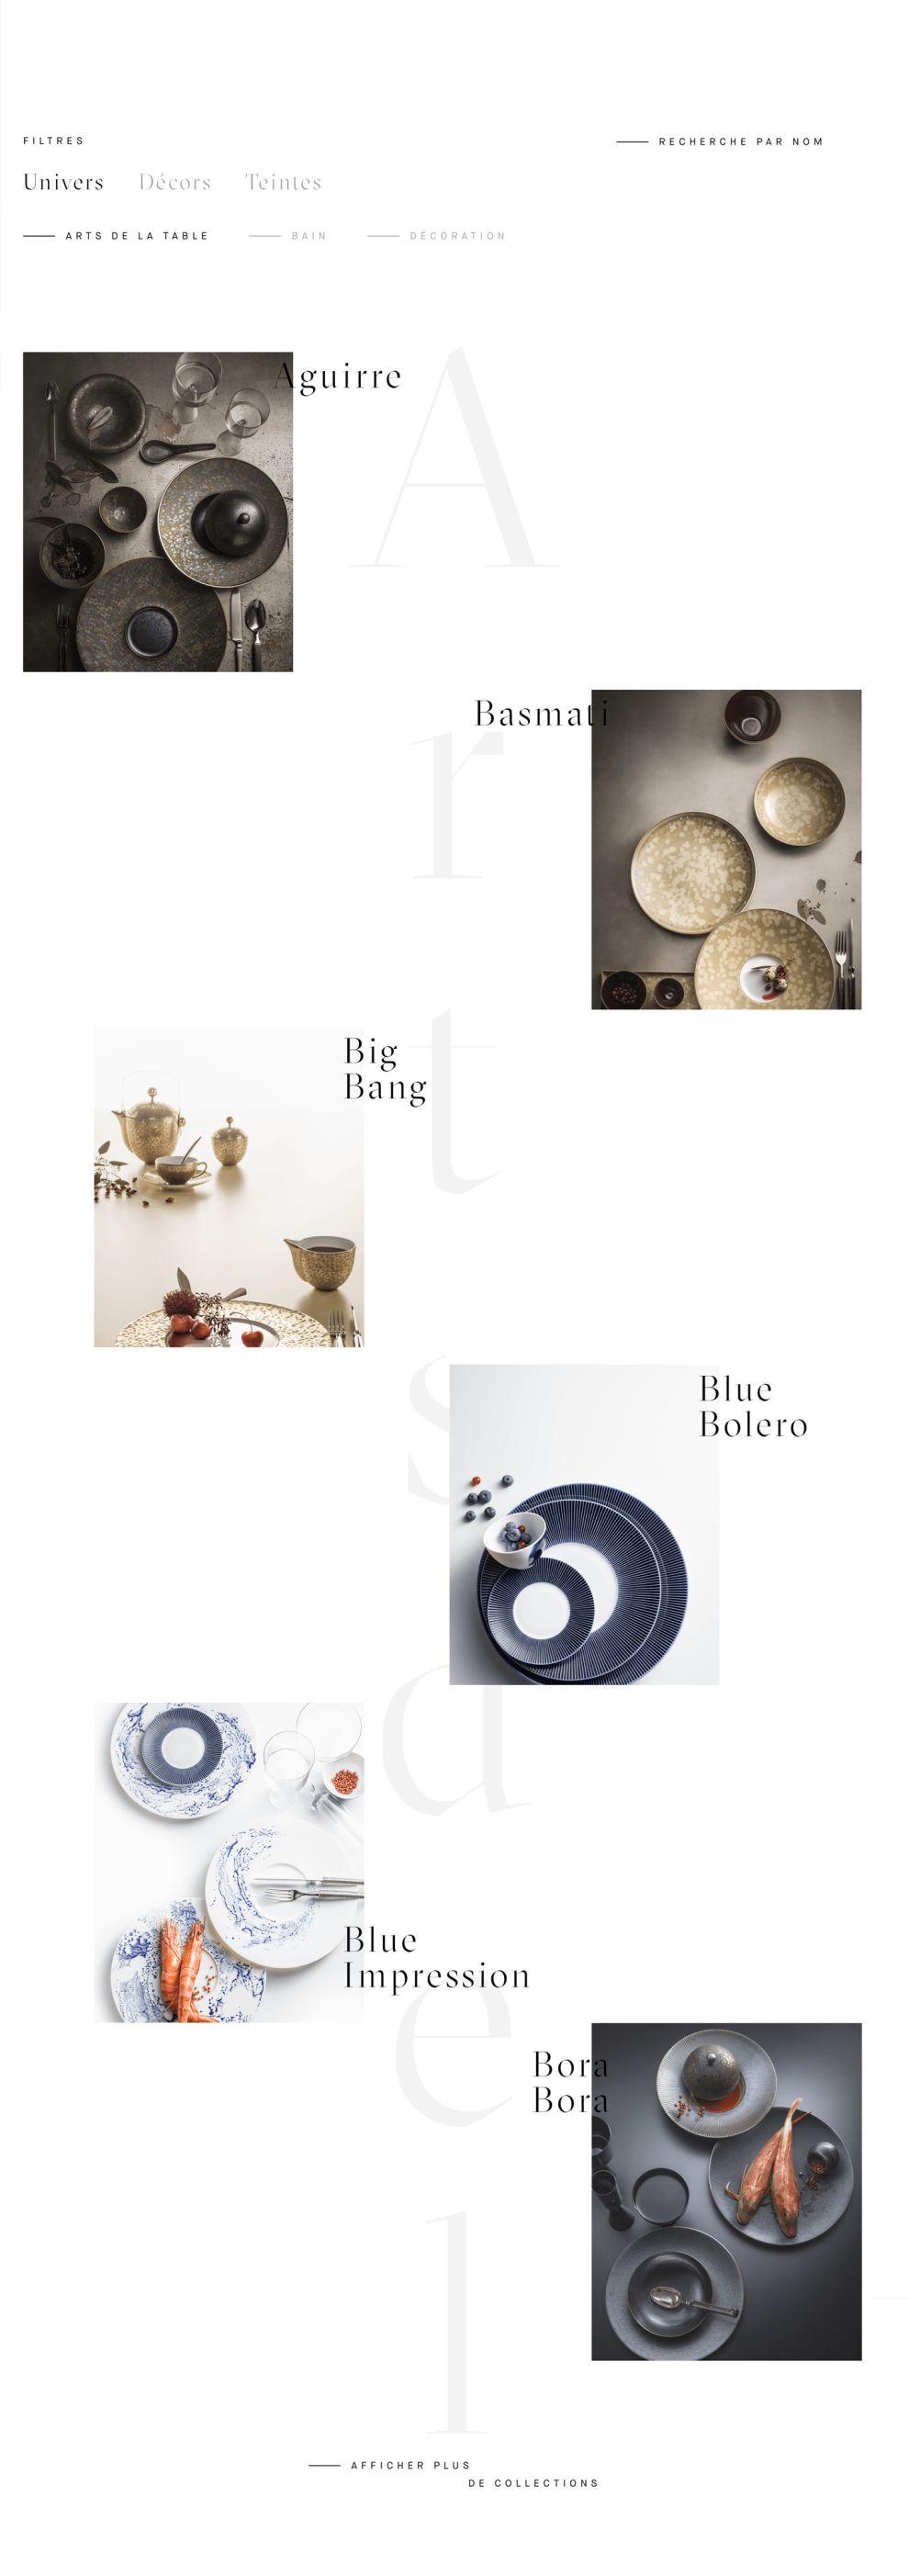 Jaunedechrome Beautiful Website Design